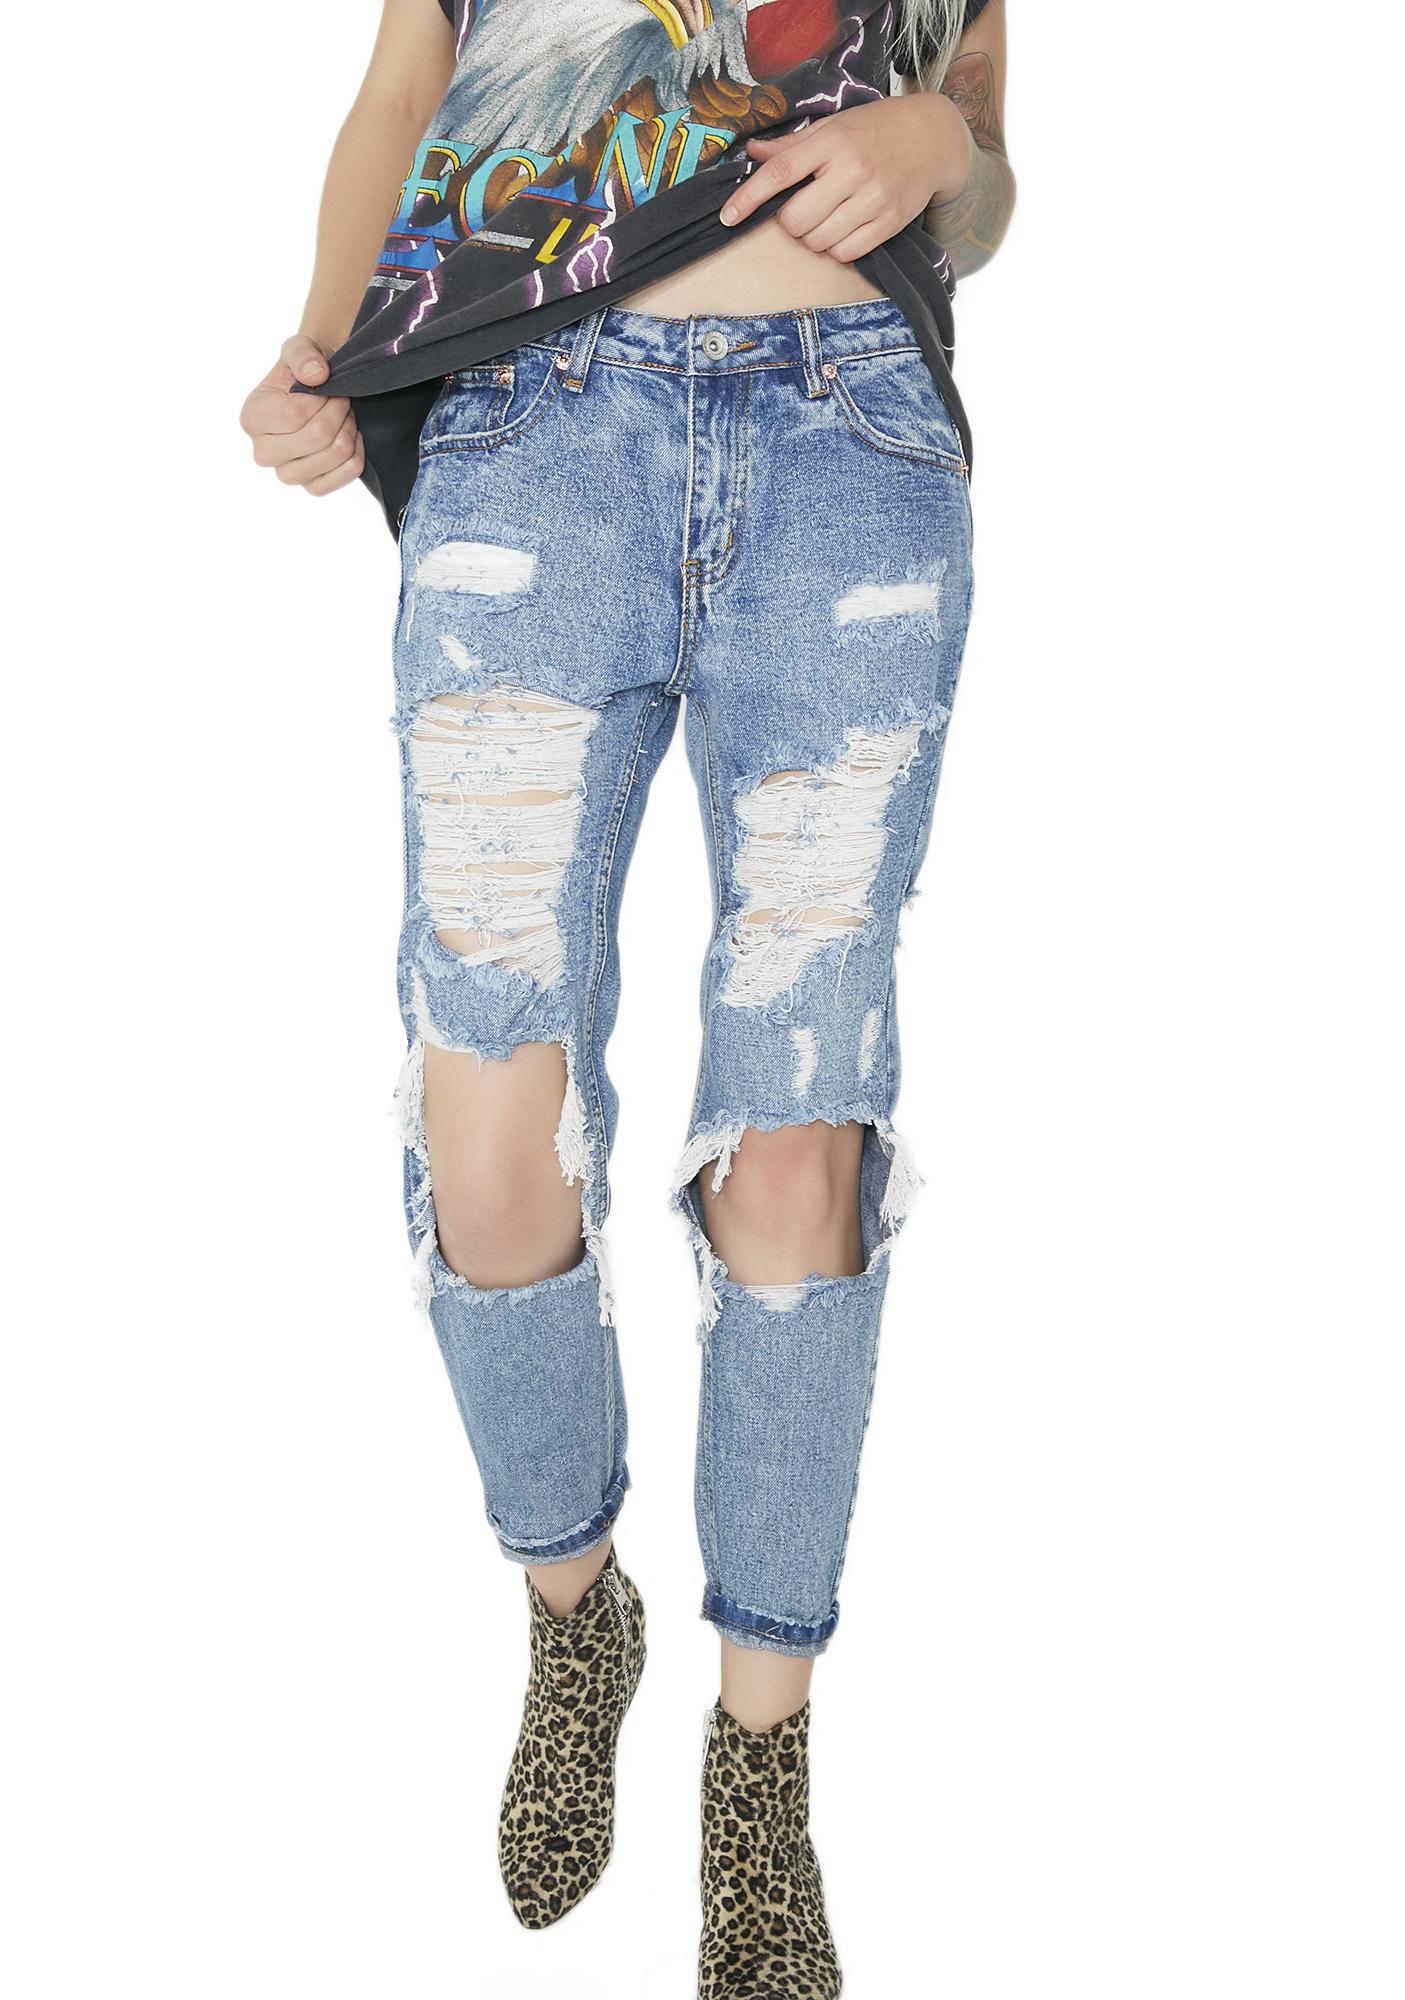 Above N� Beyond Distressed Jeans